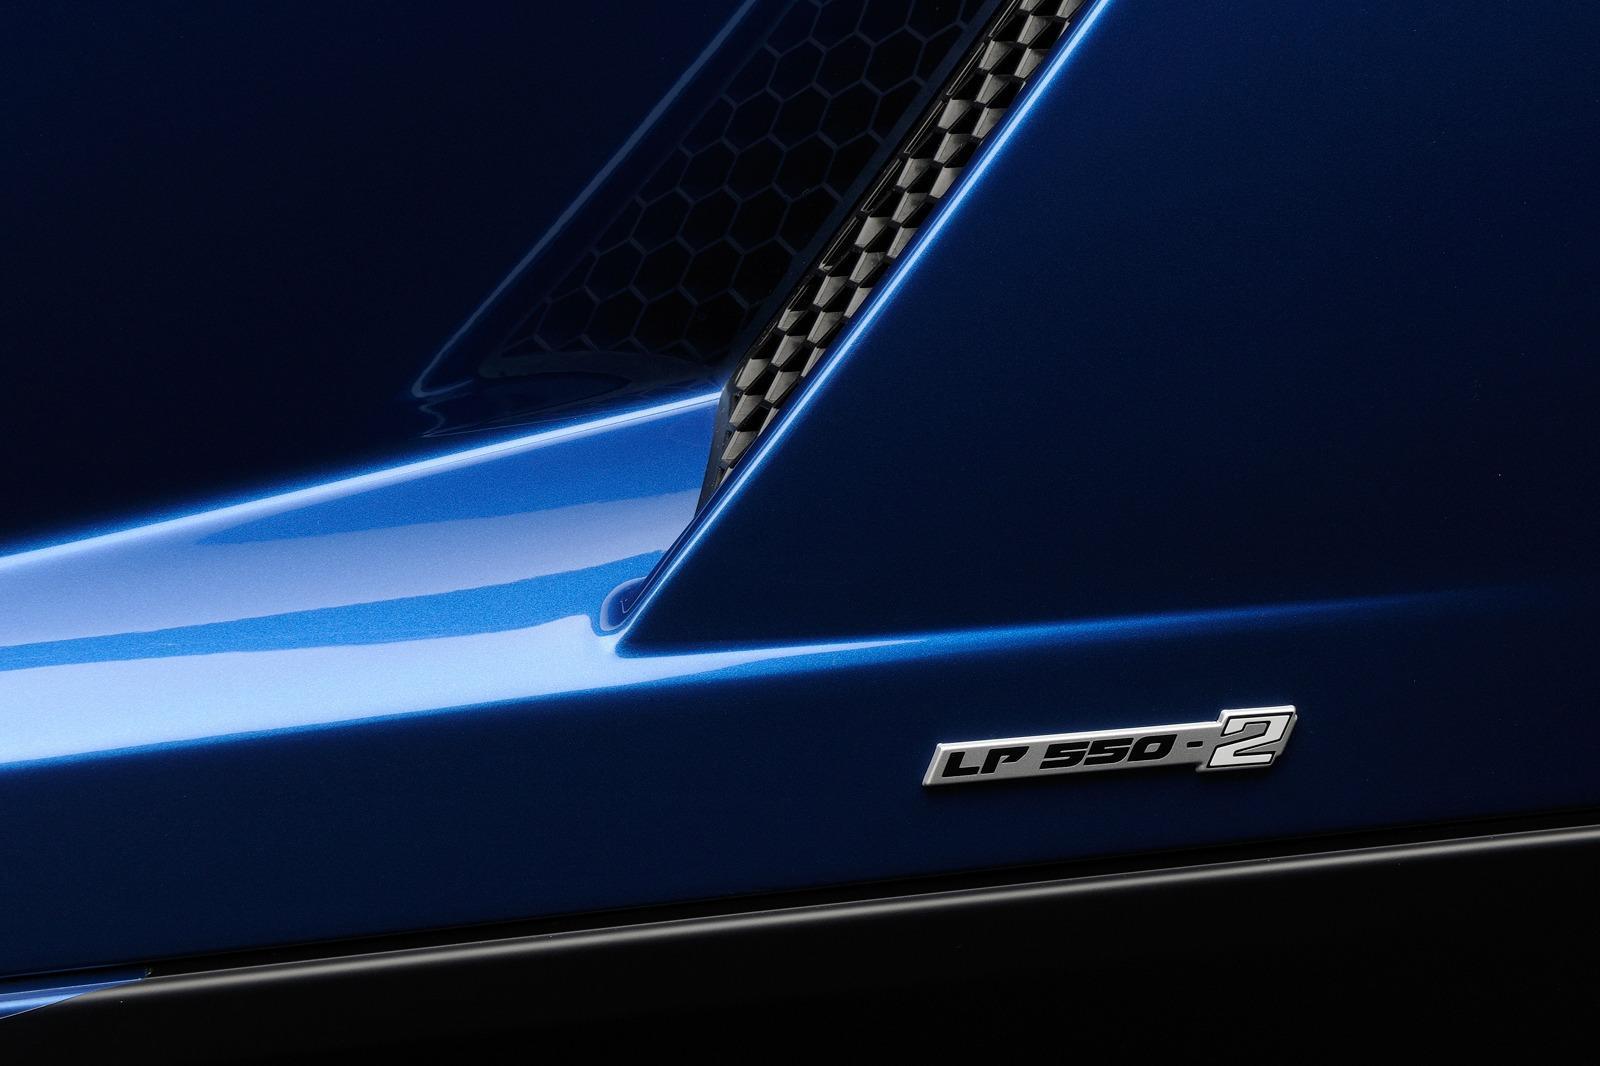 2012 Lamborghini Gallardo LP550-2 Spyder - фотография №4